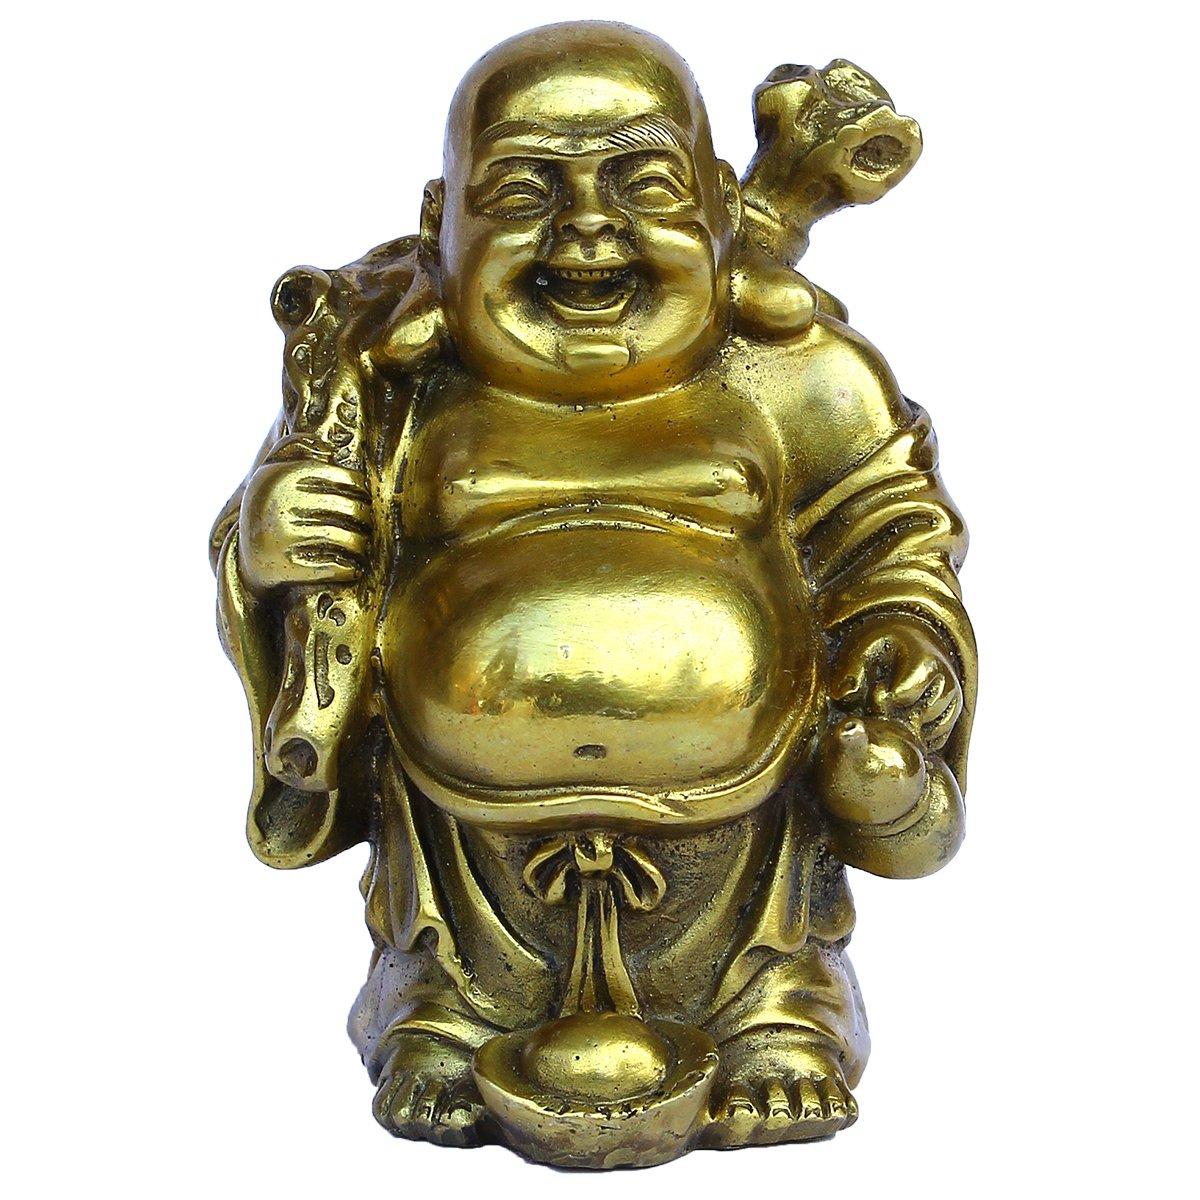 Golden Wealth Carry Lucky Bag Maitreya Buddha Happy Laughing Hotei Home Decor Housewarming Congratulatory Gift Brass Finish Collectible Figurines Statue